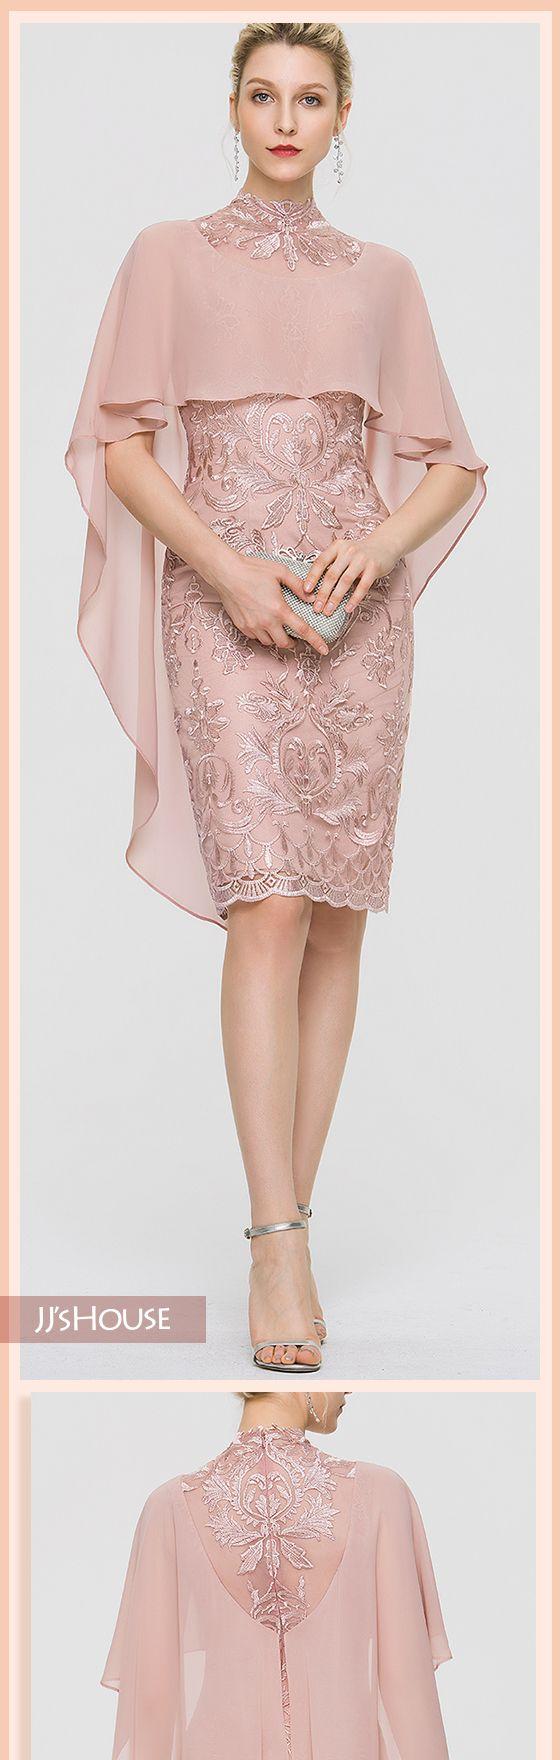 JJsHouse Sheath/Column High Neck Knee-Length Lace Cocktail Dress #cocktaildress